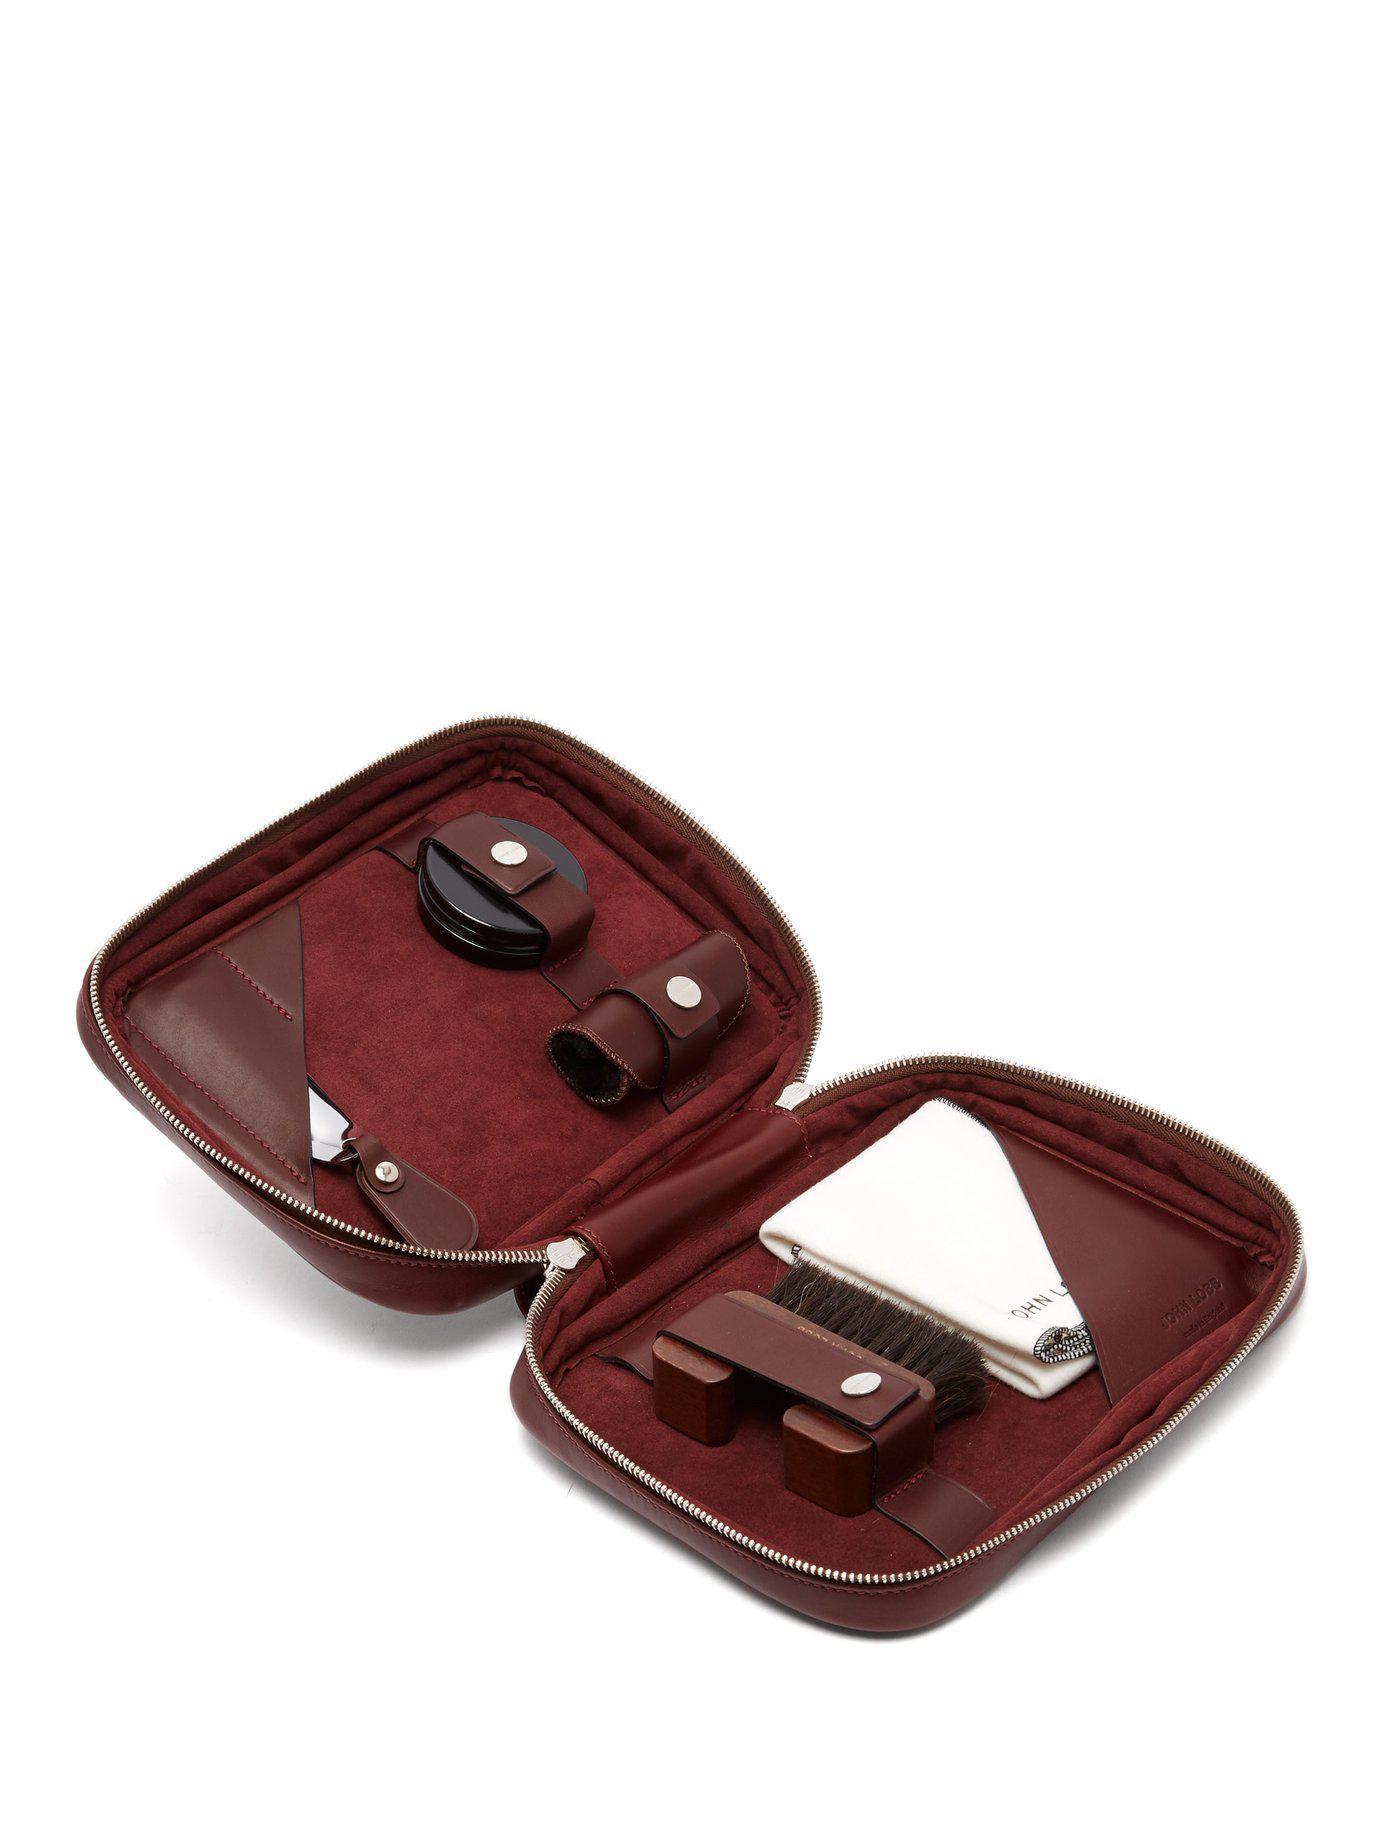 62f2580e44 Frye Hobo Bags Purses Nordstrom. John Lobb Women S Shoe Care Leather. Lyst  John Lobb Shoe Care Leather Travel Case